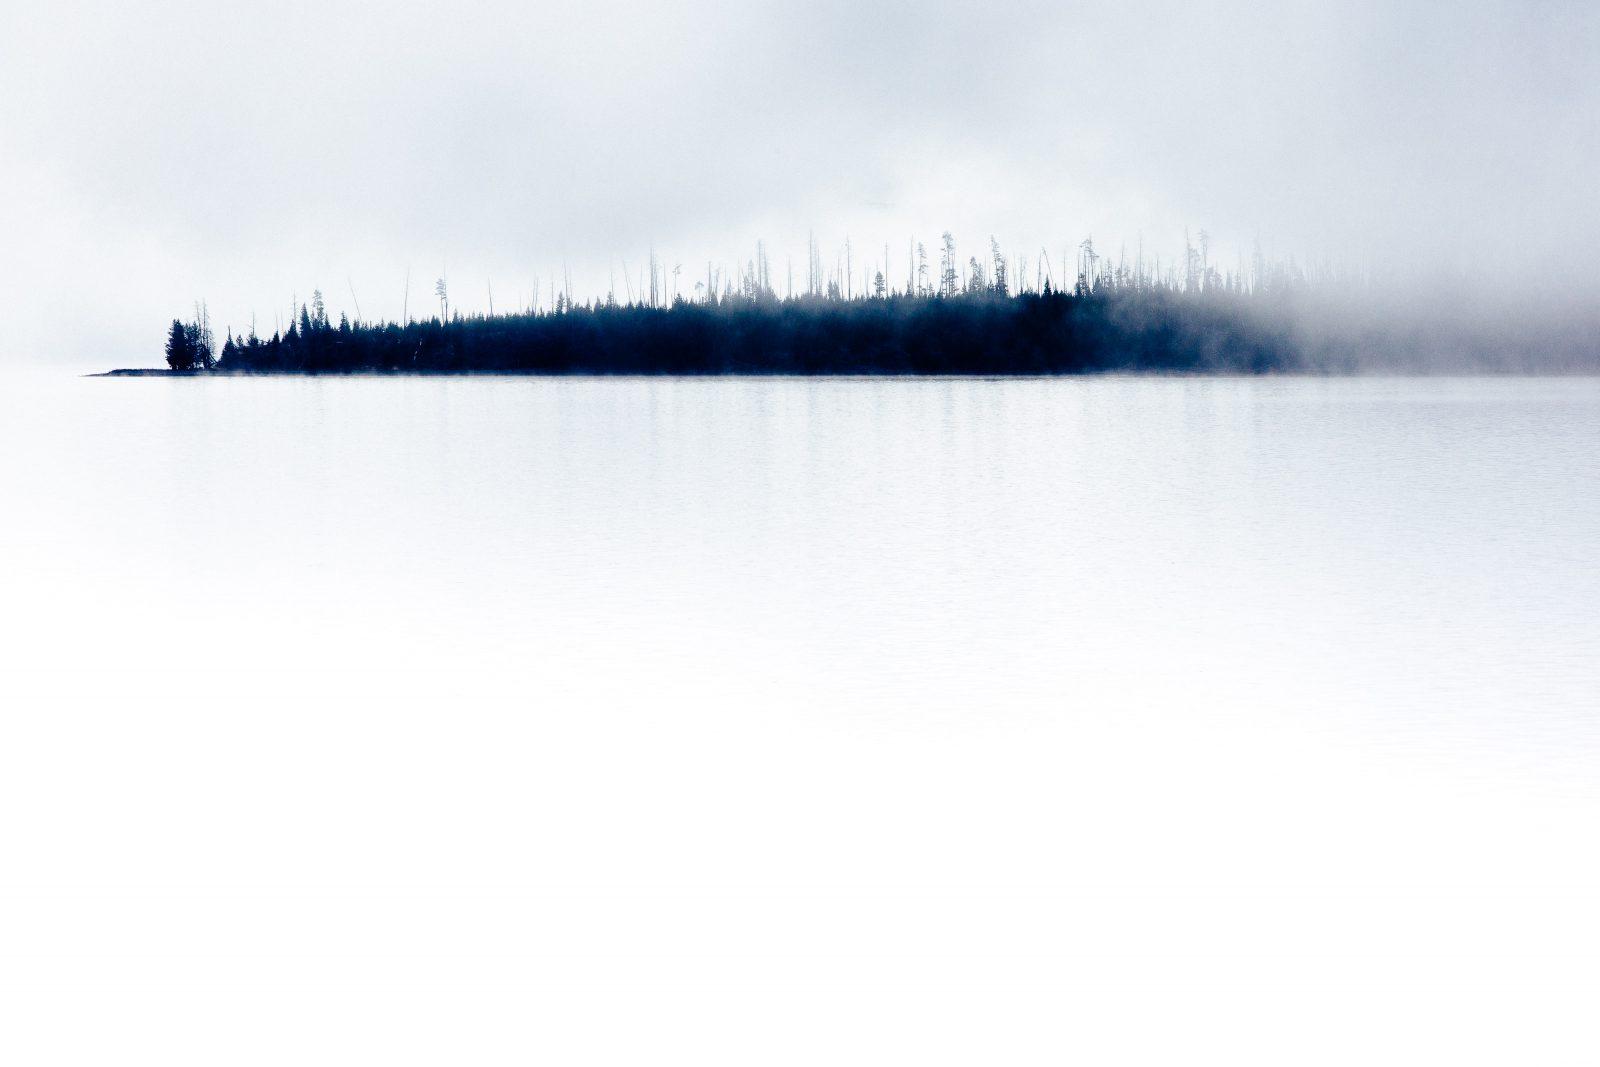 Yellowstone Lake Mist limited-edition print by Jay Goodrich